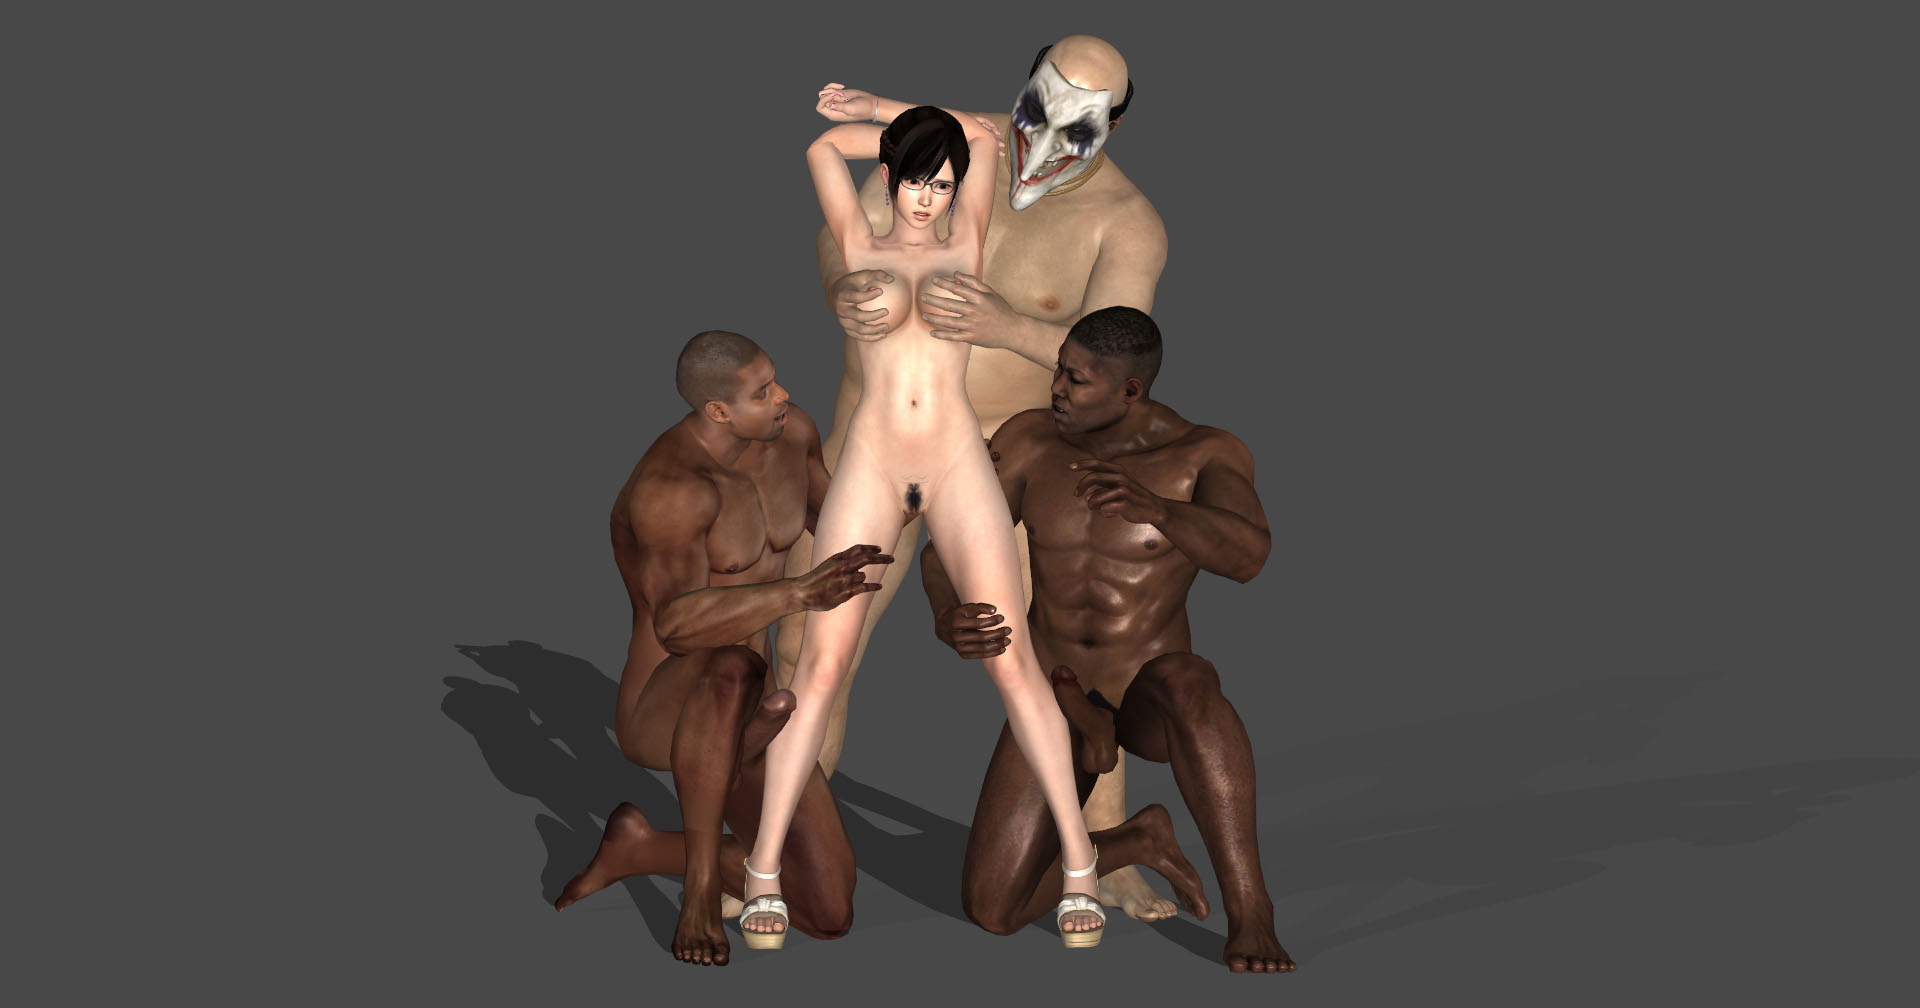 kokoro_making_porn_0000_layer_4_by_bitemonsters-dbhglbn.jpg